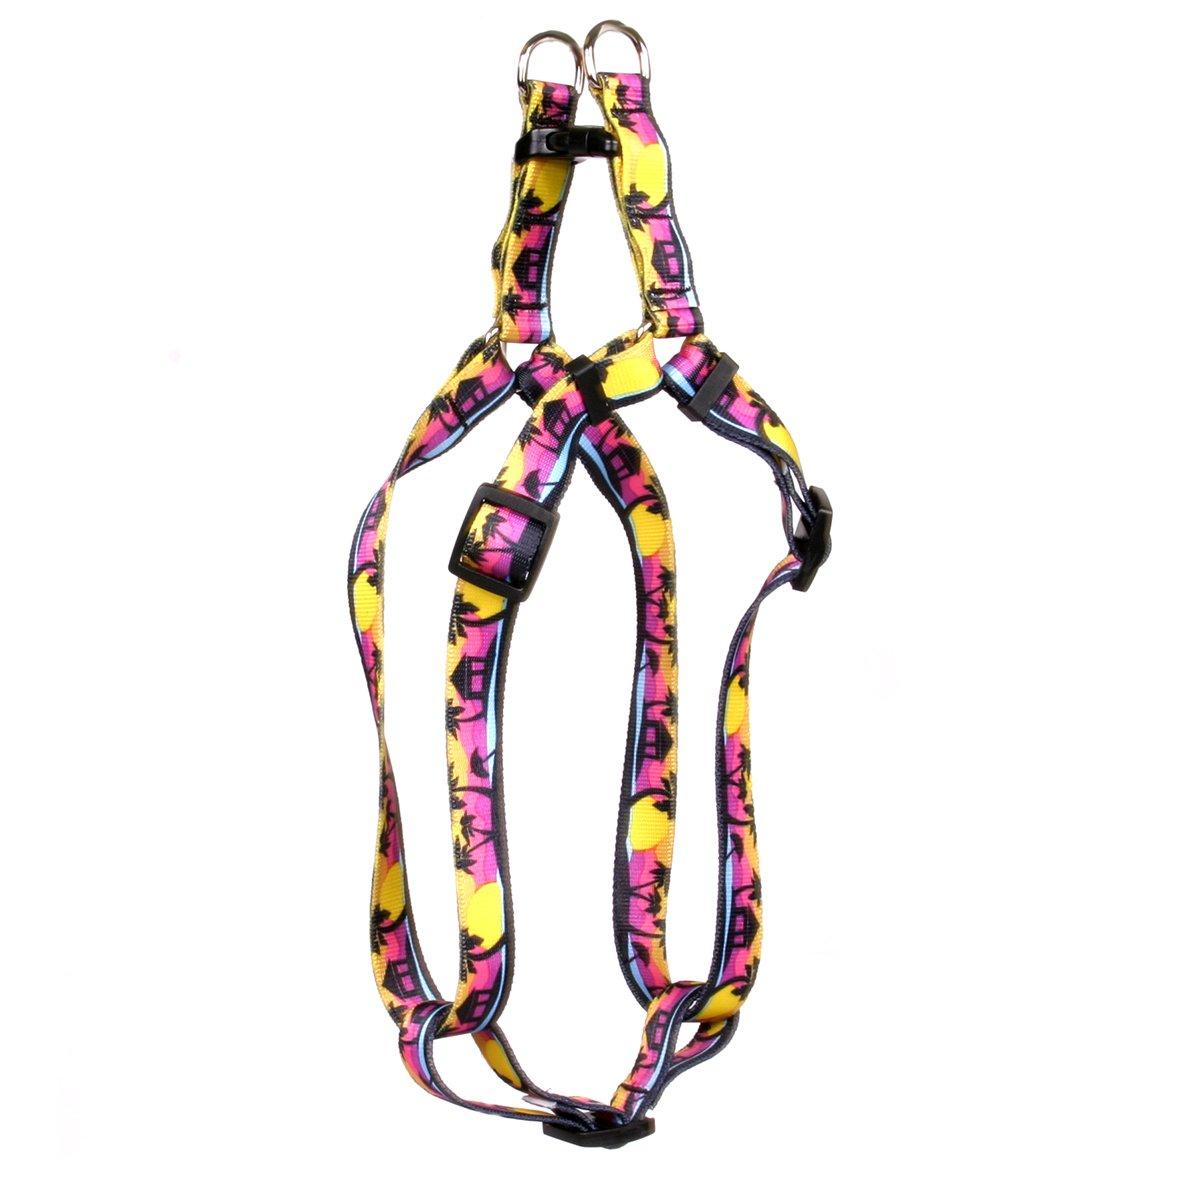 Yellow Dog Design Standard Step-In Harness, Palm Tree Island, Small 9'' - 15''